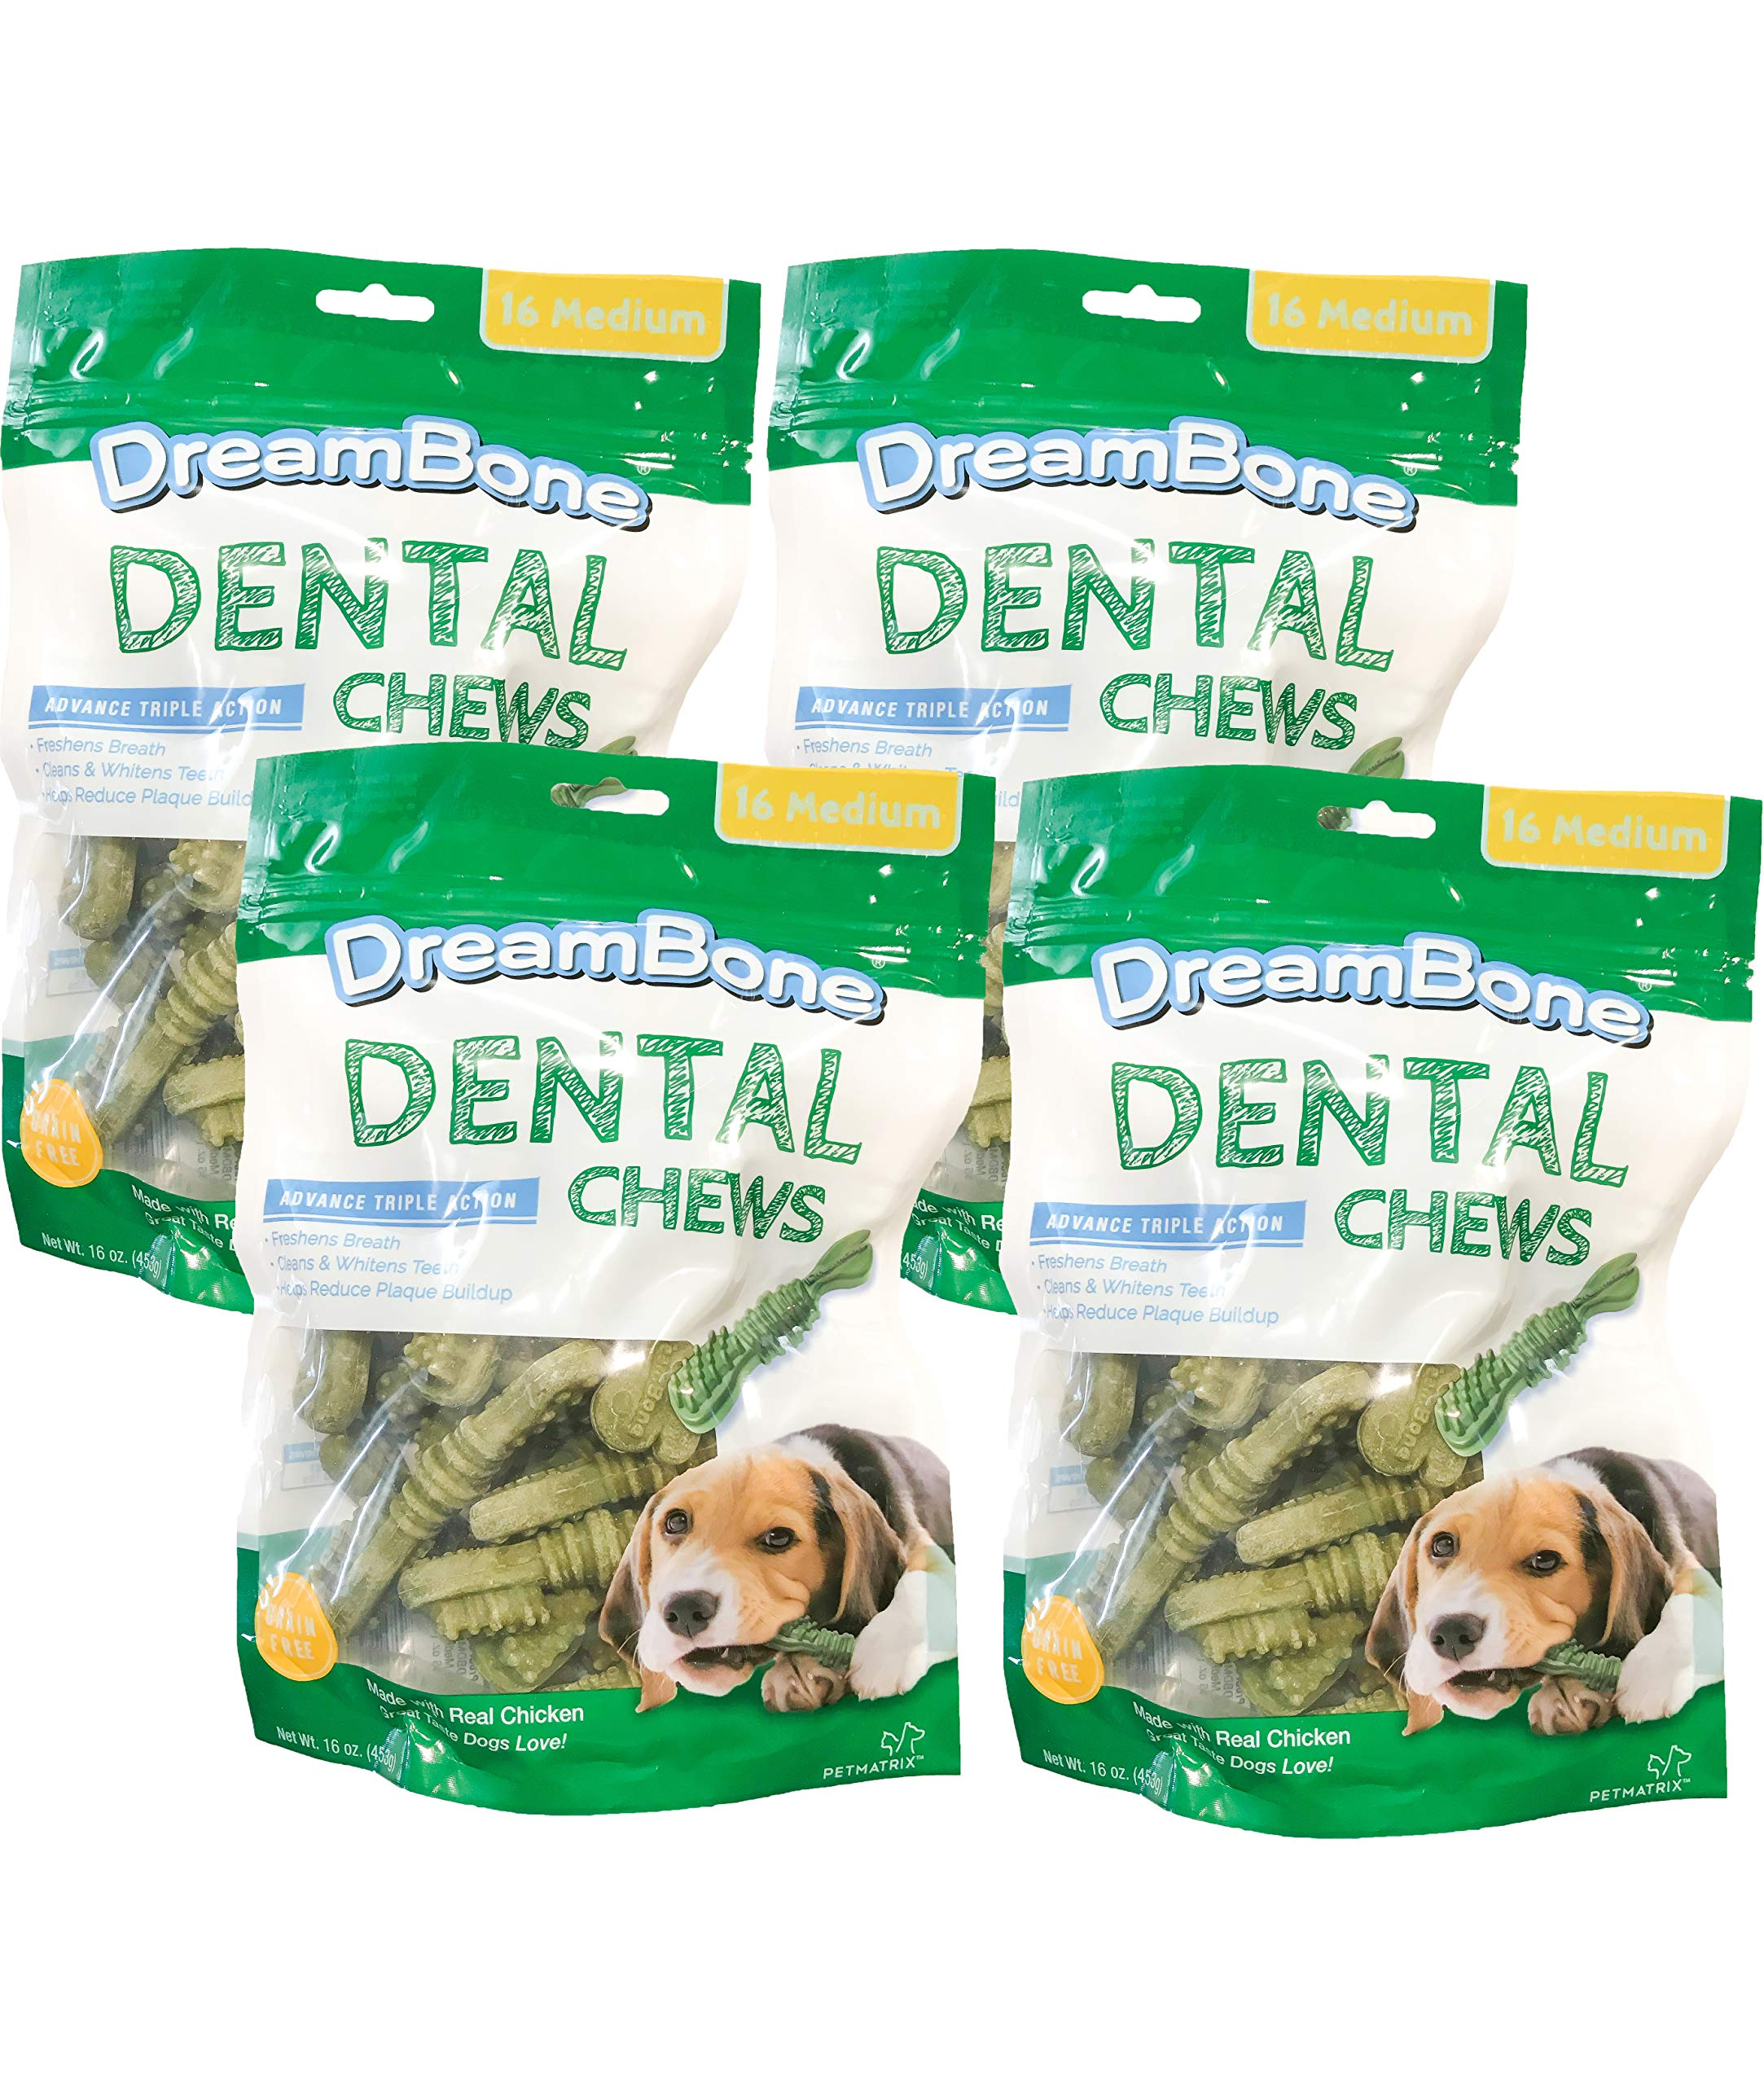 DreamBone Dental Dog Chew, Rawhide Free, Reduce Tartar & Whiten Teeth (Medium, 16 Pieces/Pack, 4 Pack)